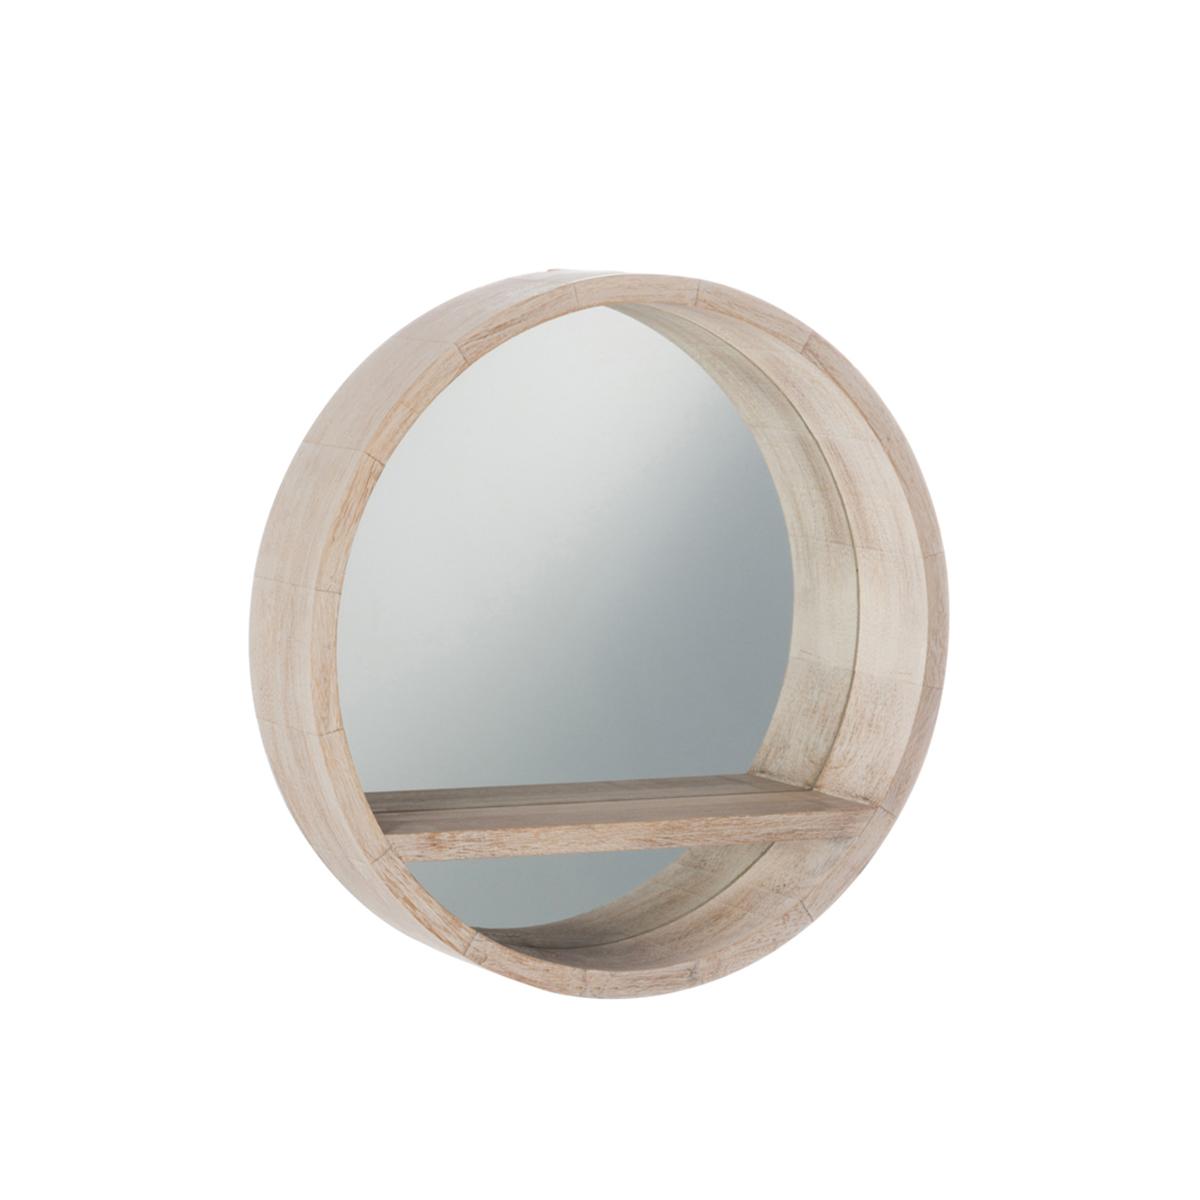 J-Line spejl - Wood Round - S